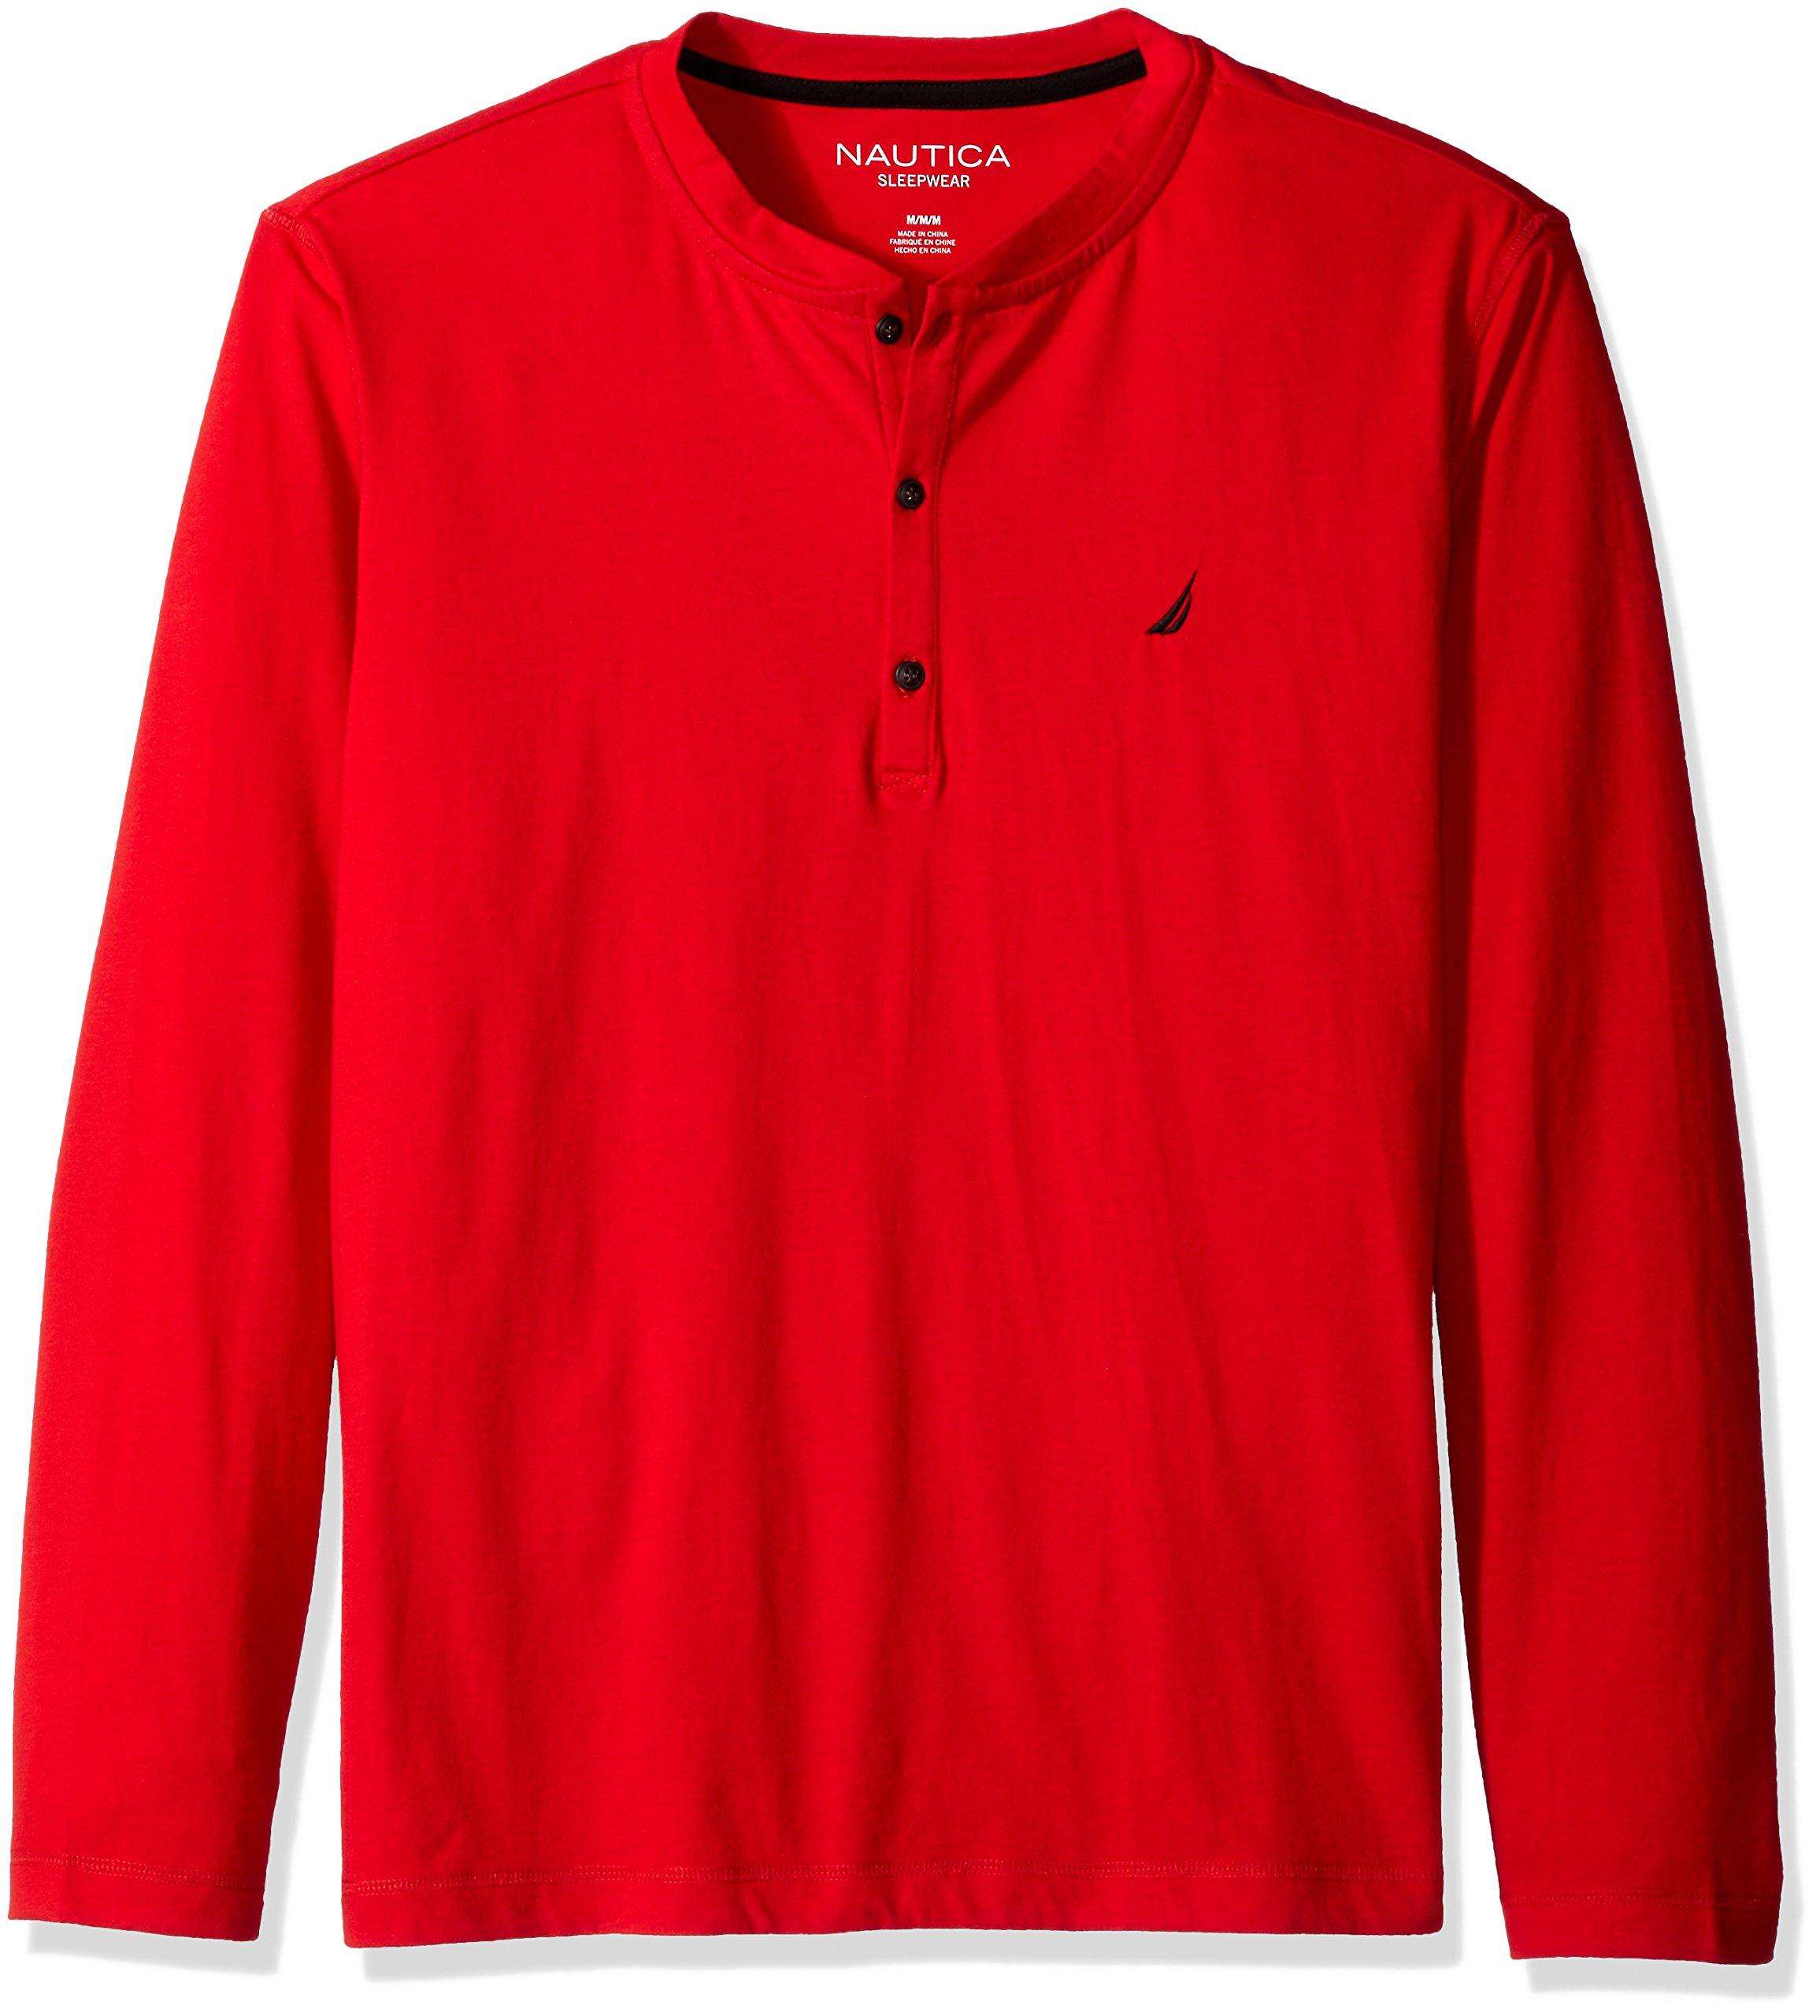 Nautica Men's Long Sleeve Henley Pajama Top, Red, Small